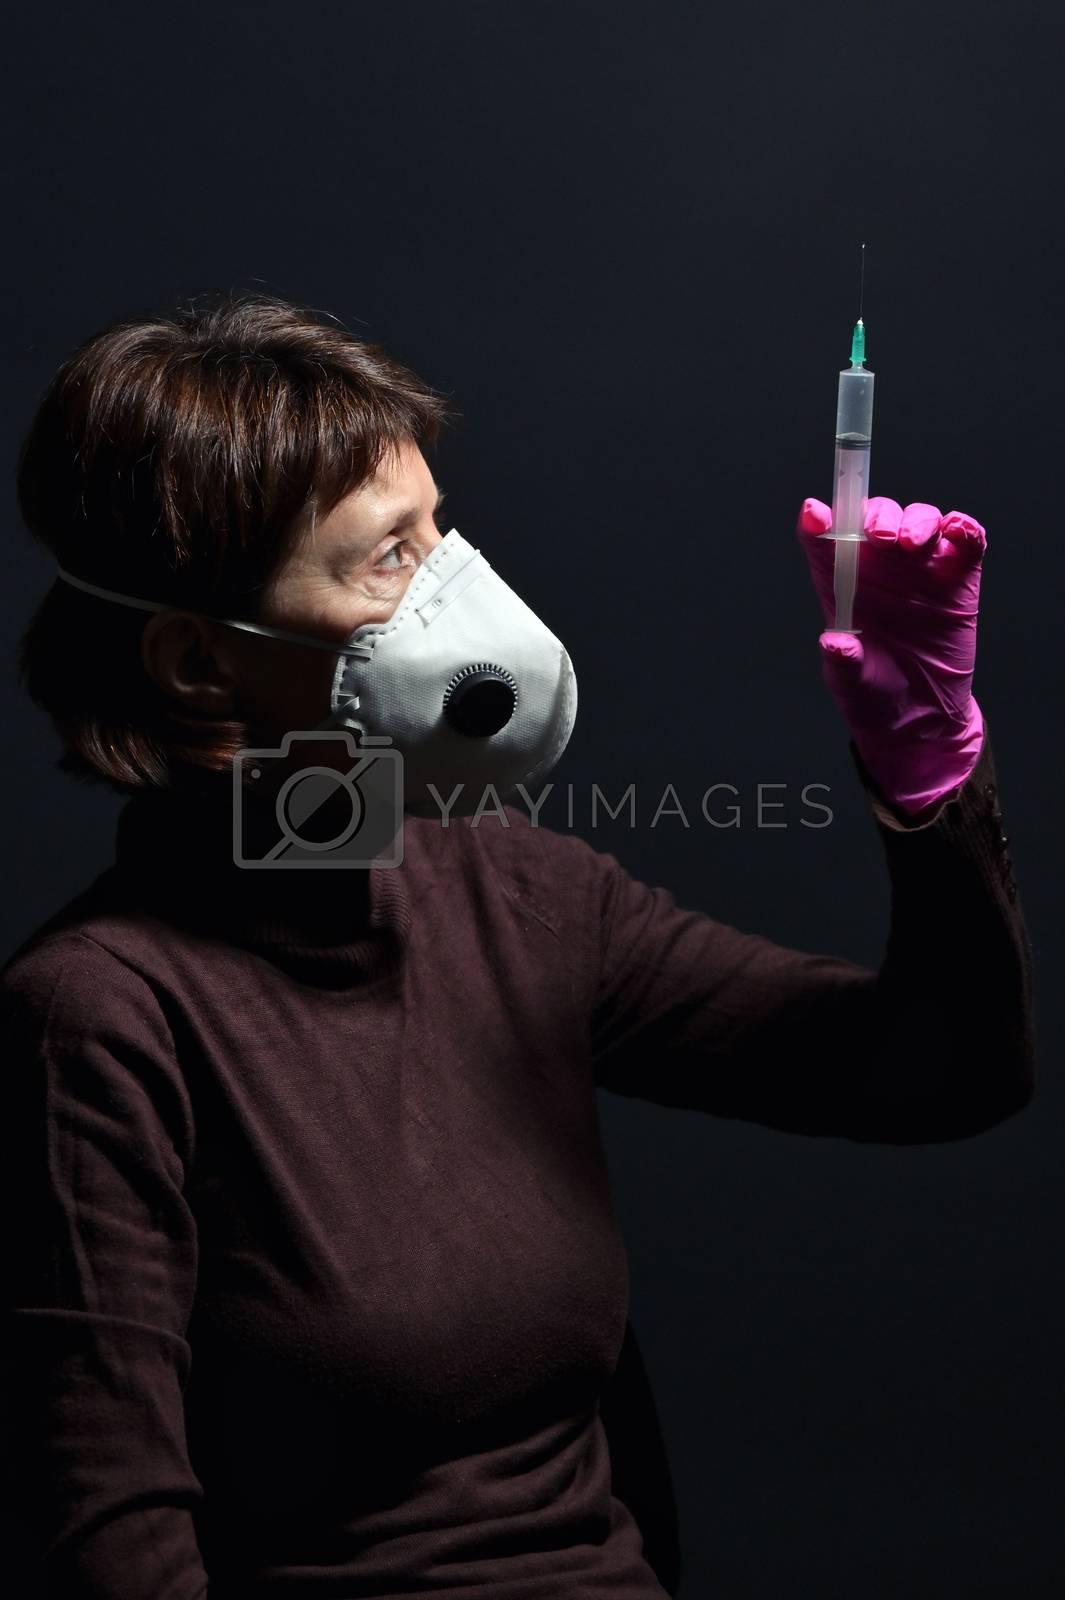 Woman Wearing Medical Protective Virus Mask and Syringe